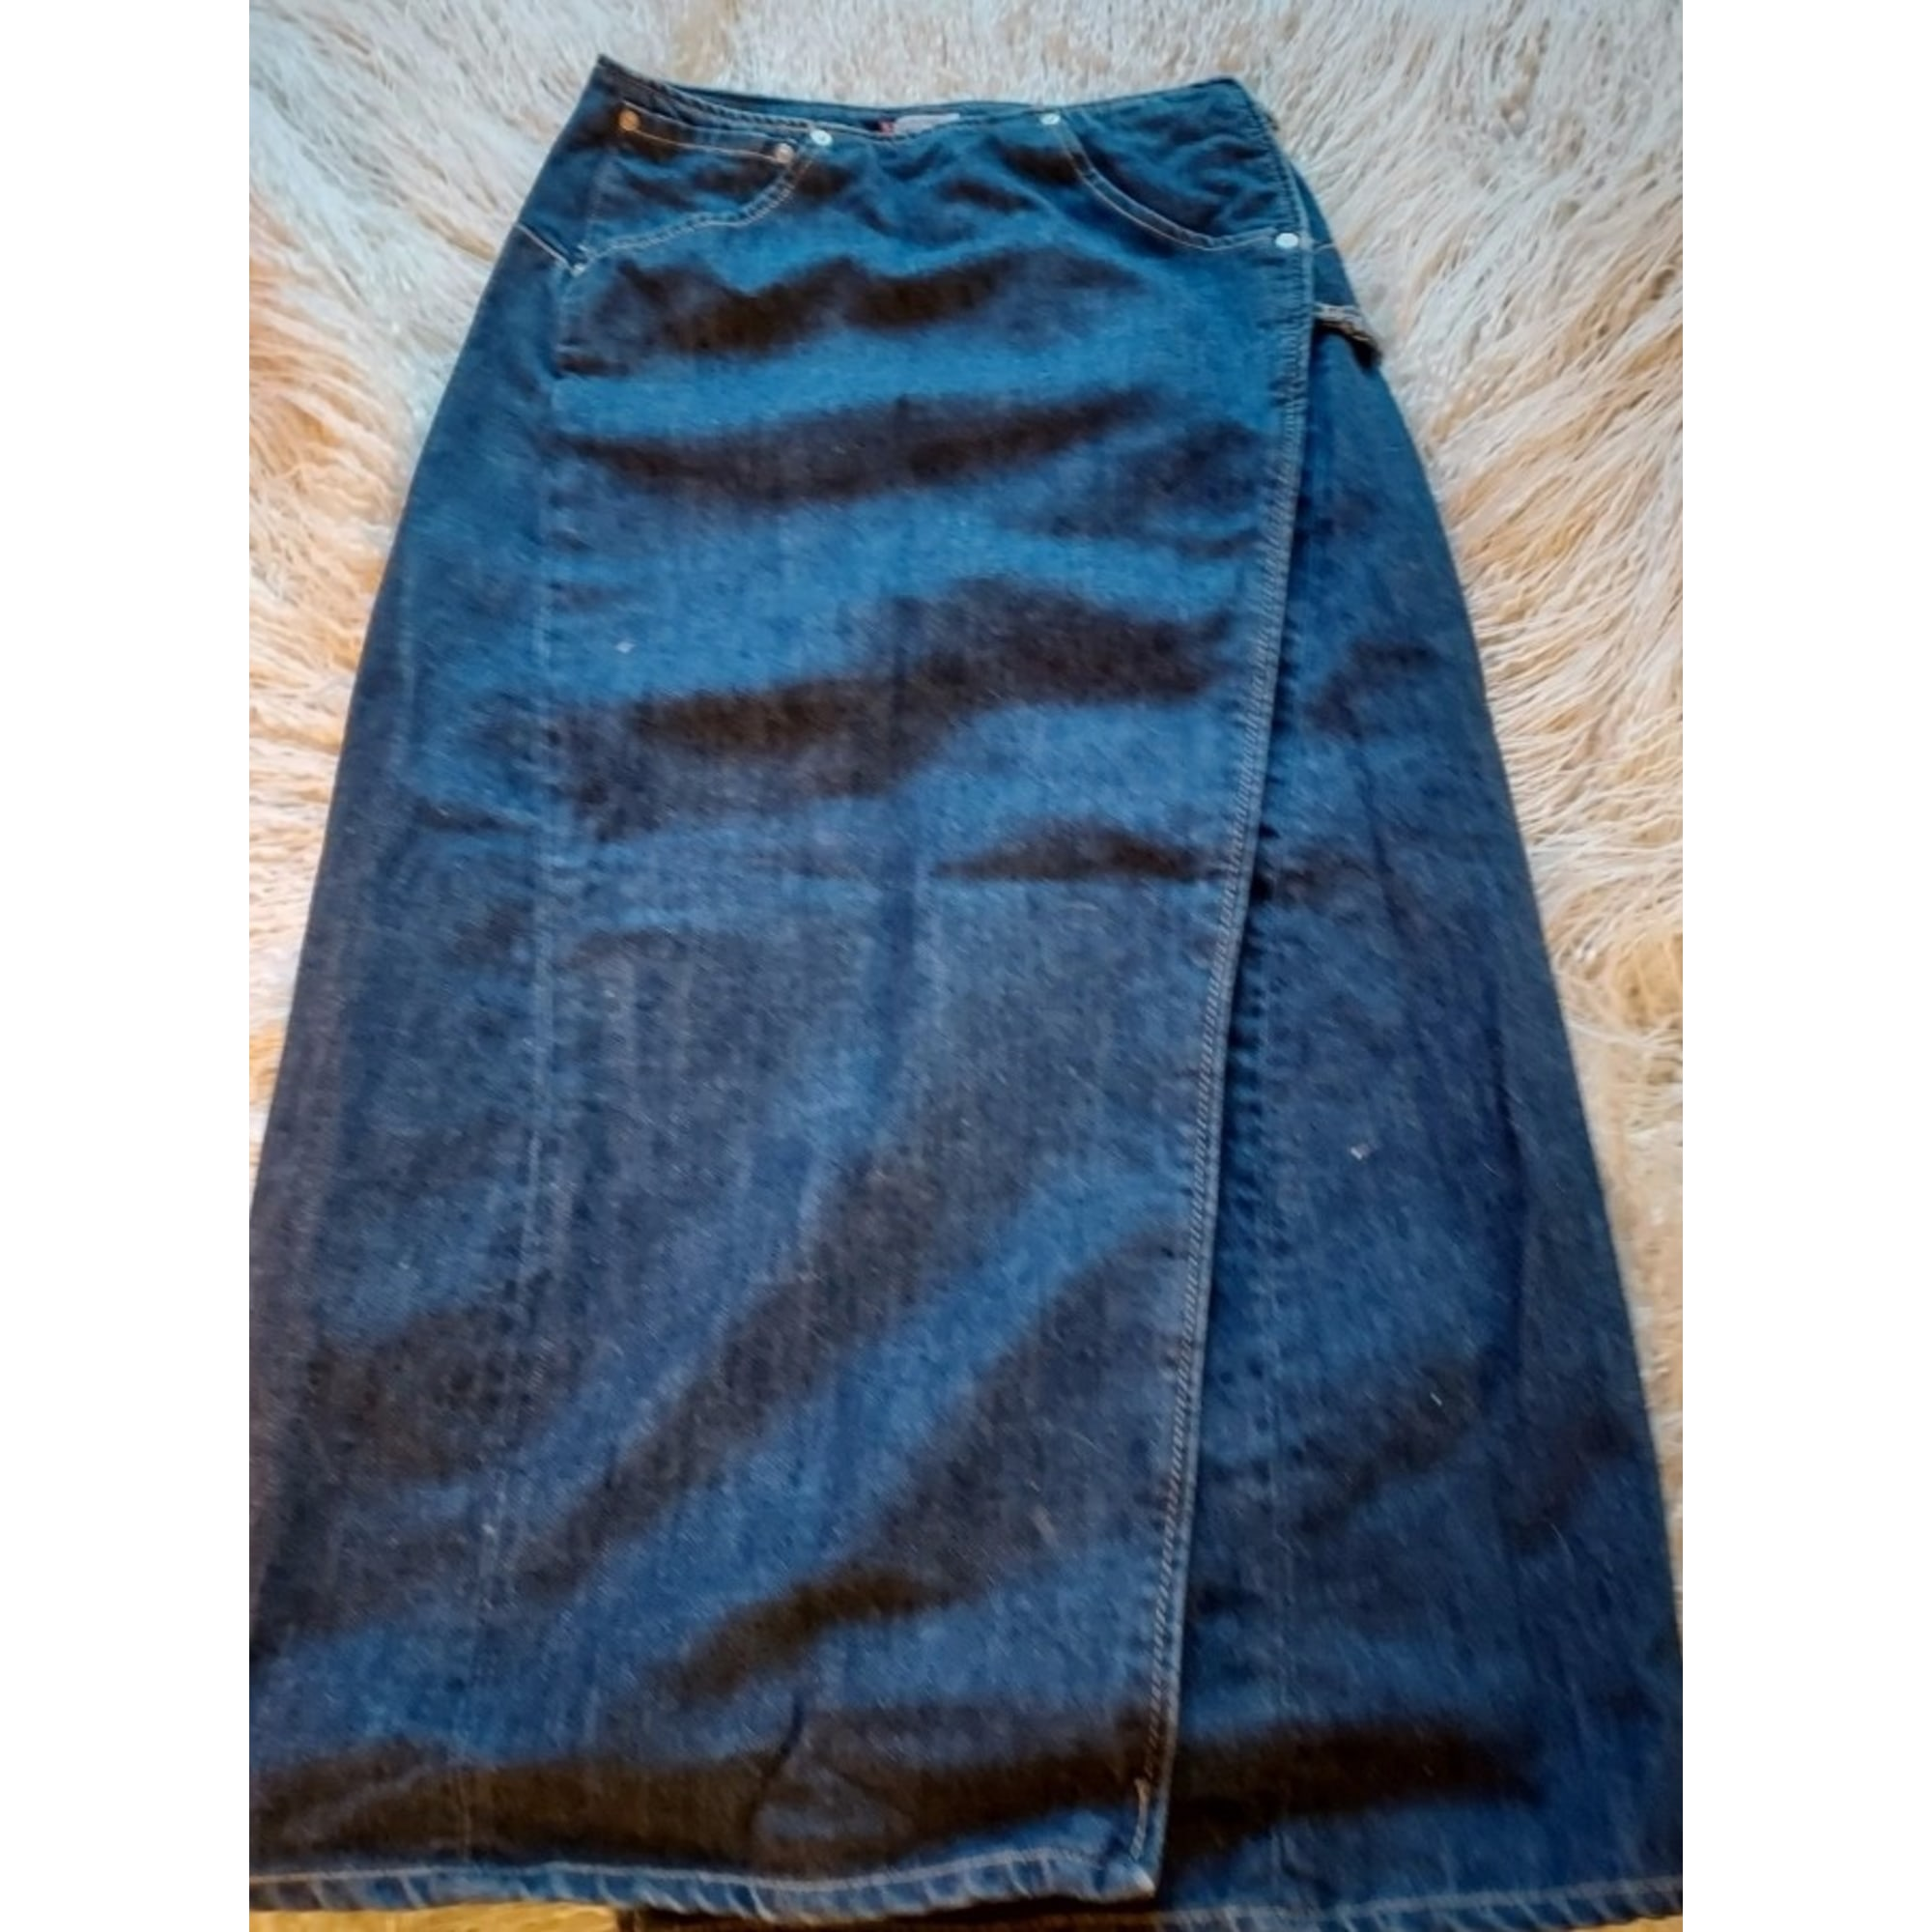 Jupe en jean LEVI'S Bleu, bleu marine, bleu turquoise